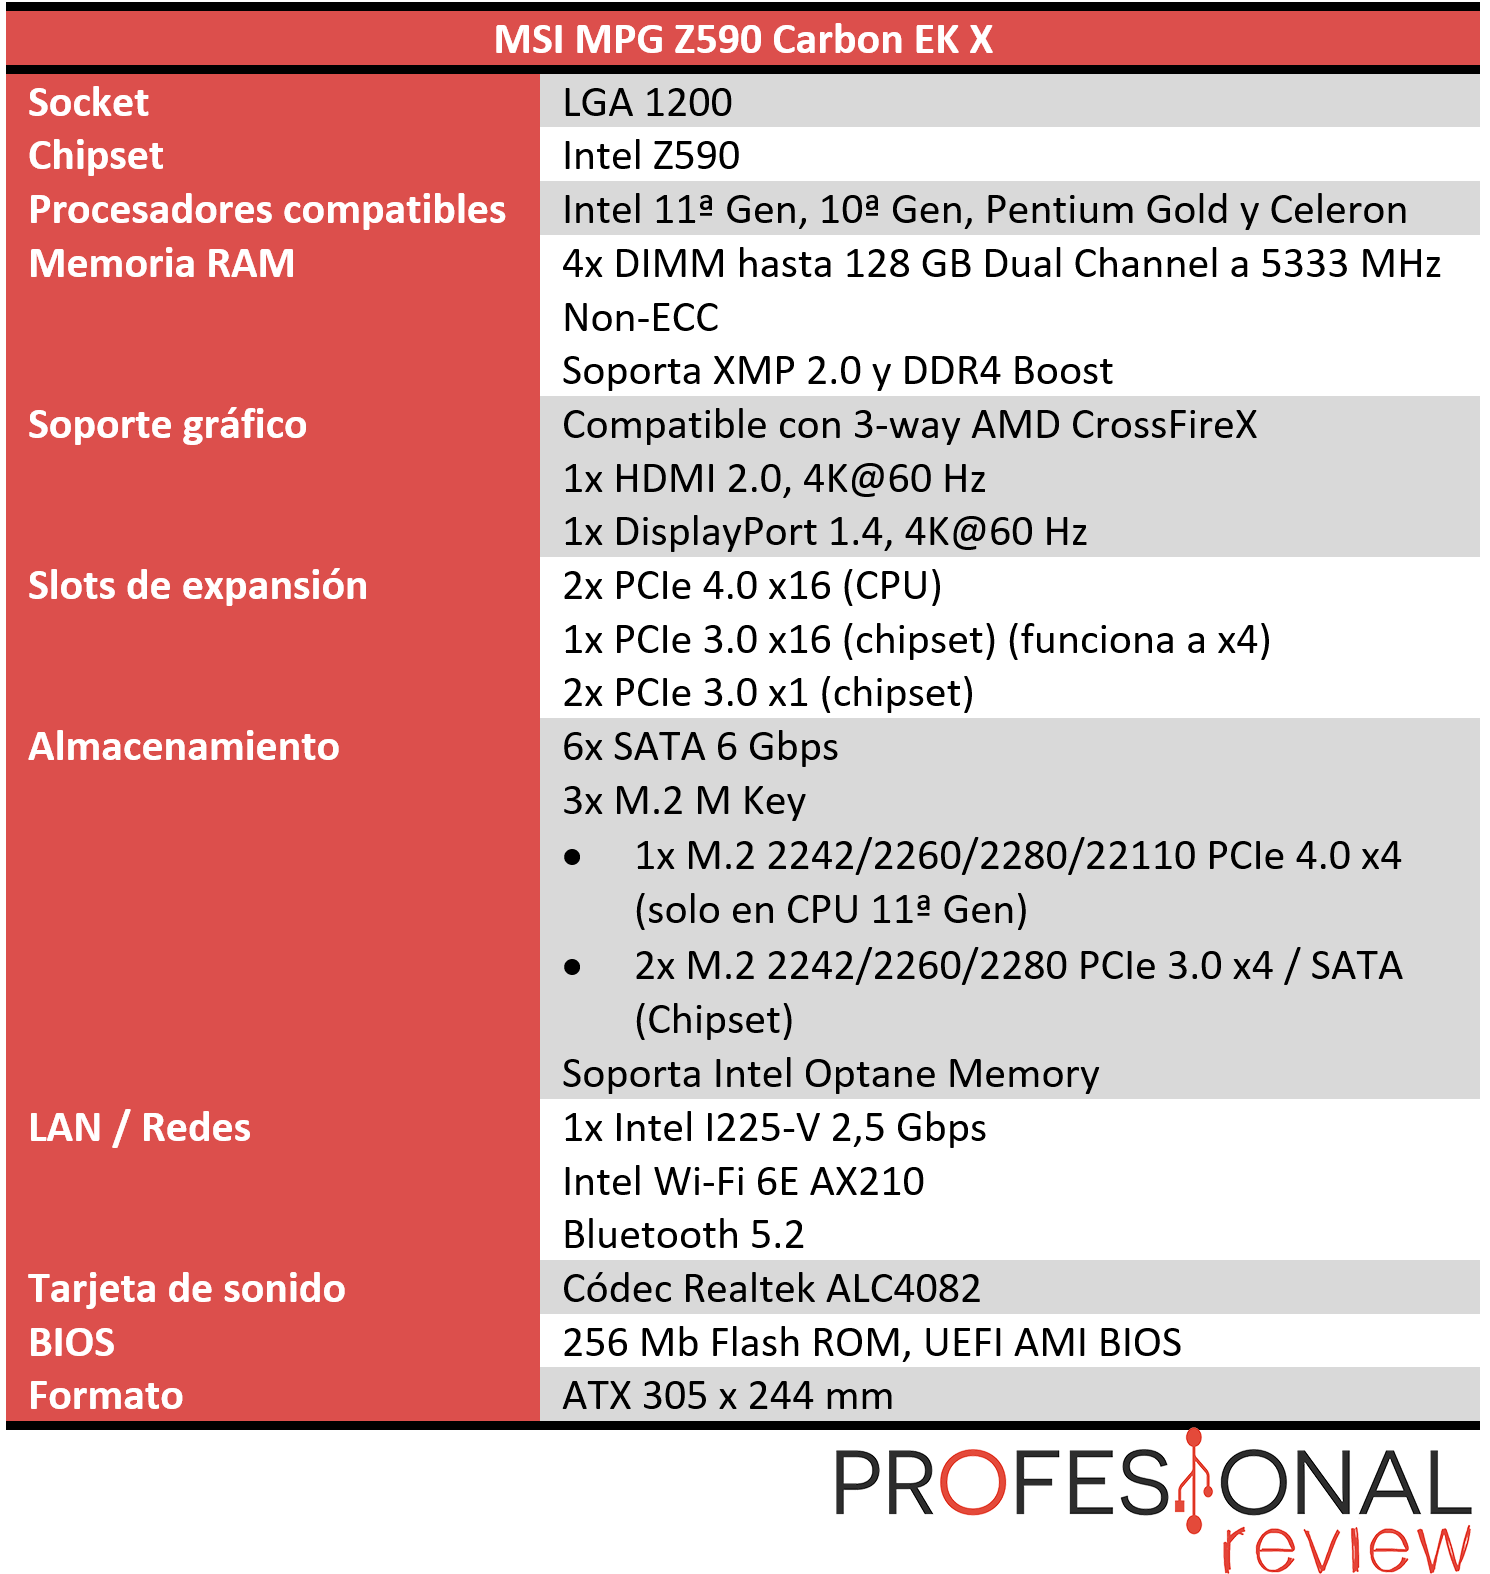 MSI MPG Z590 Carbon EK X Características